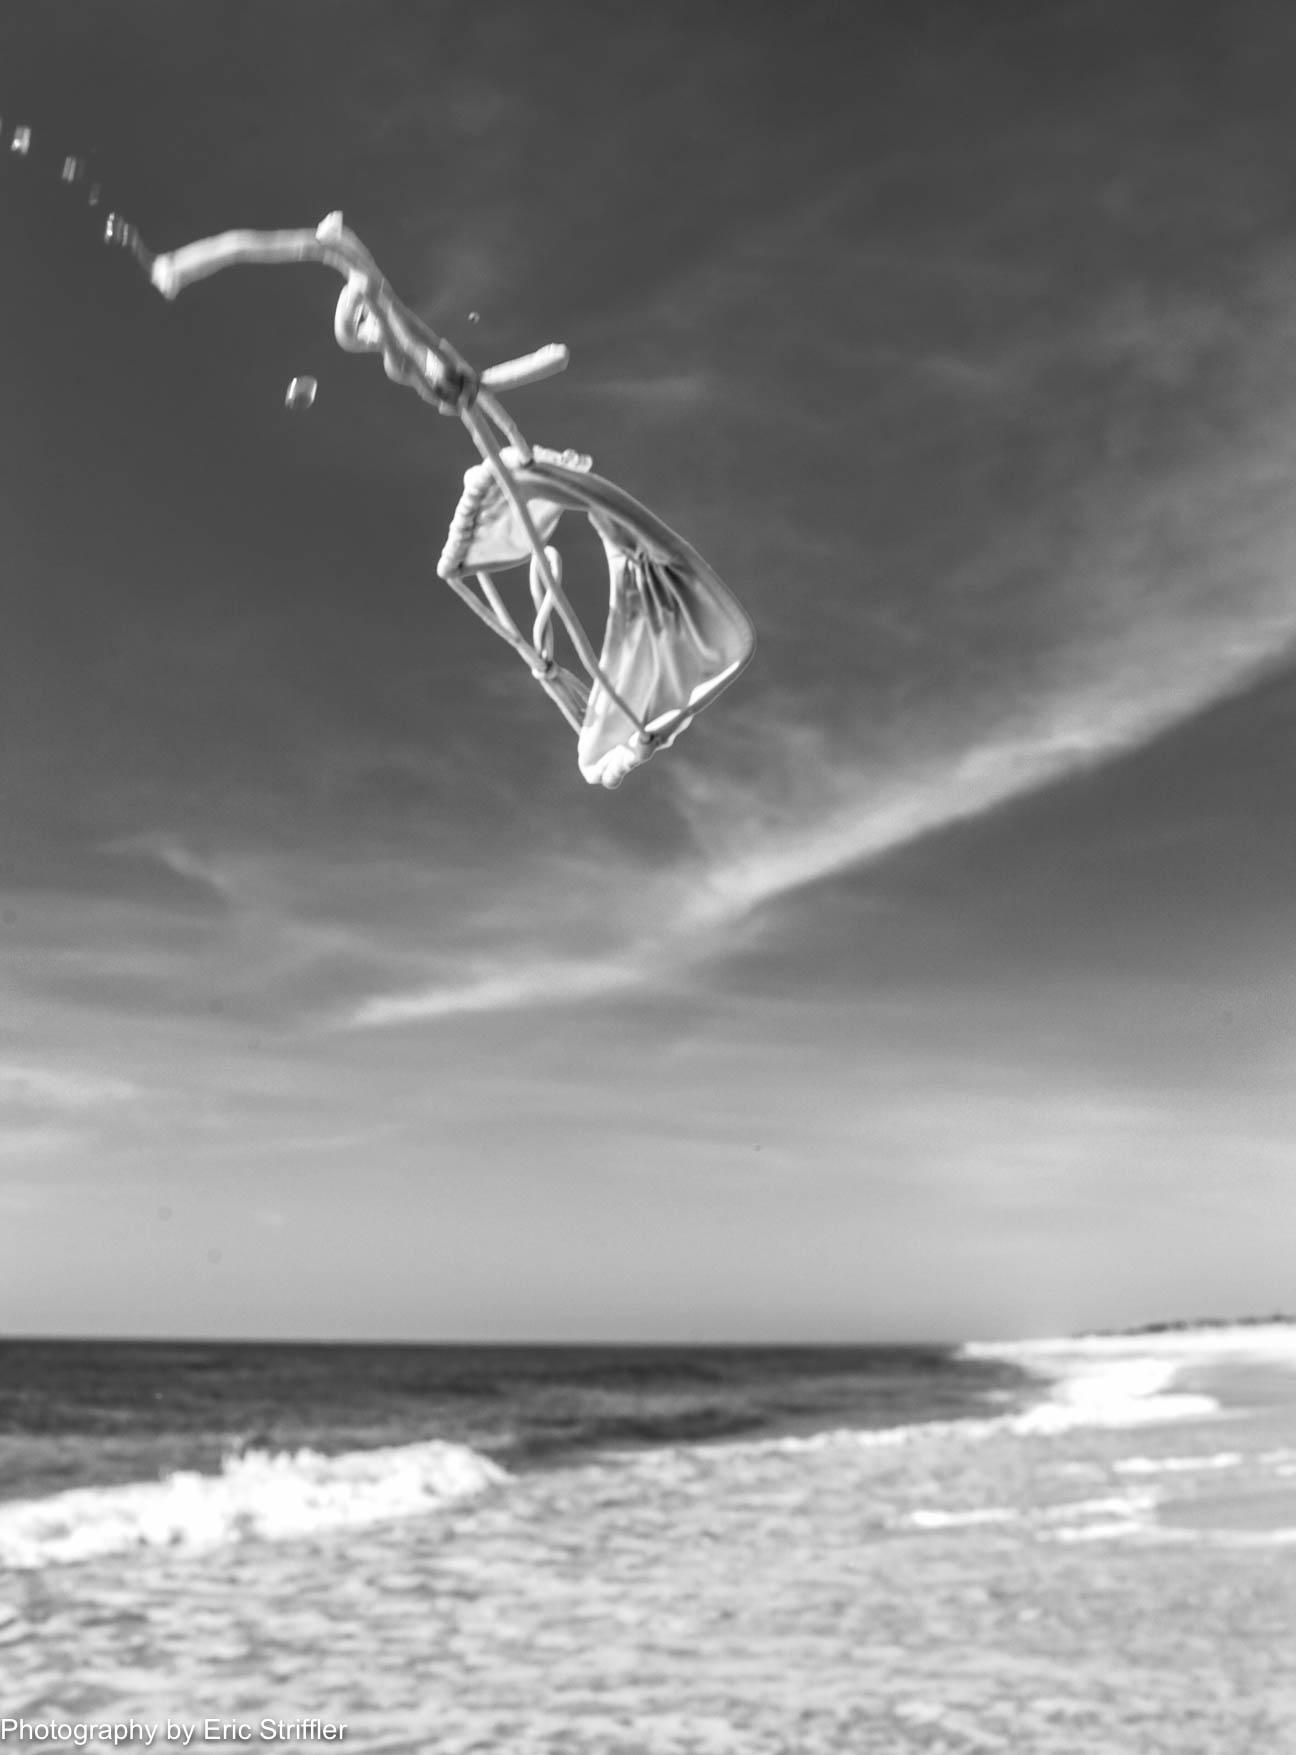 beach-tumbleweed_tue2018-7373.jpg